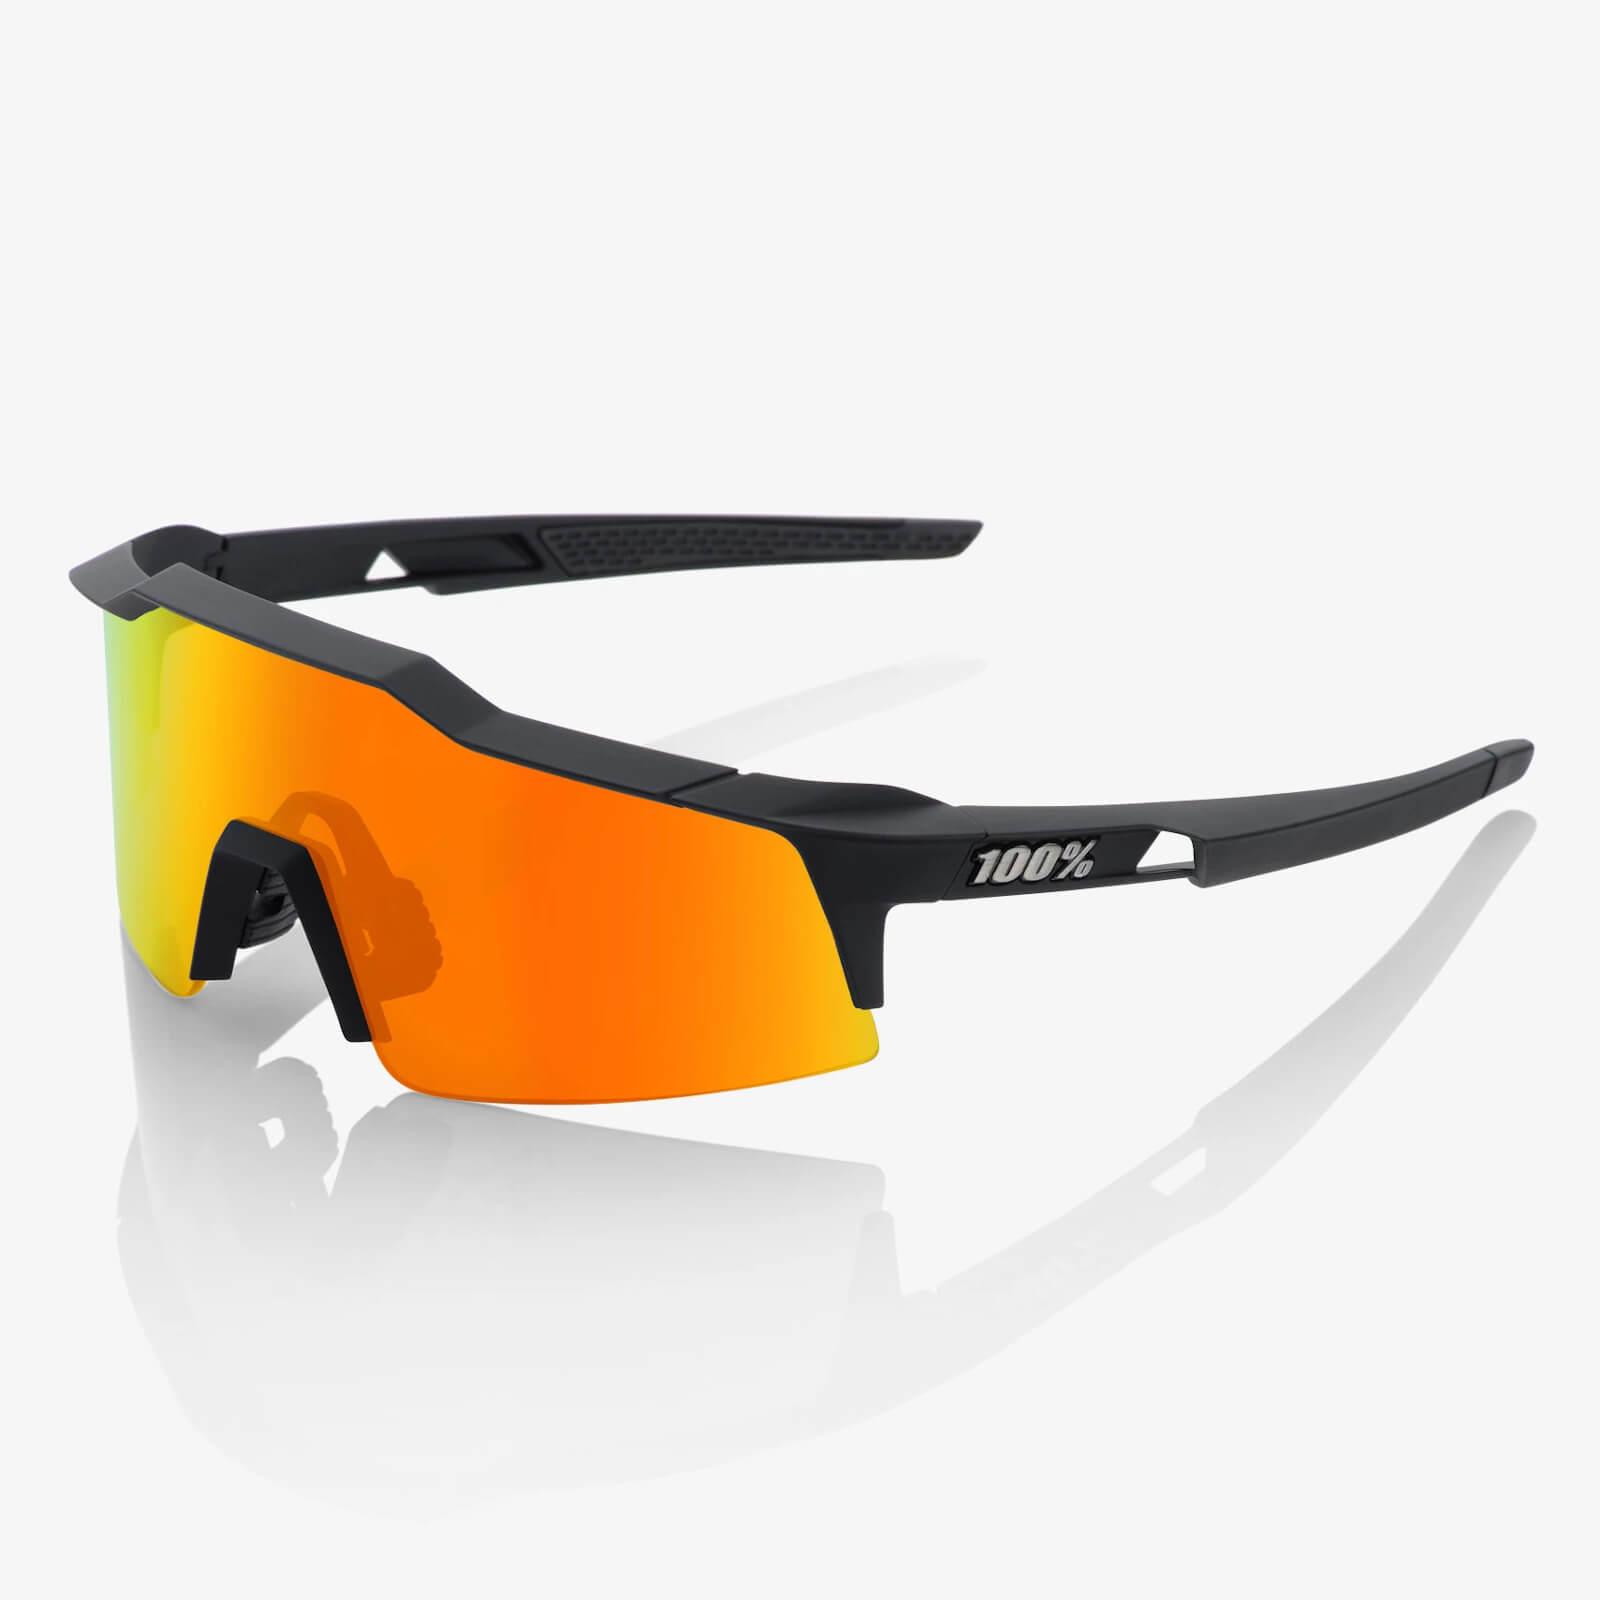 100% Speedcraft Sl Sunglasses With Hiper Mirror Lens - Soft Tact Black/red Lens